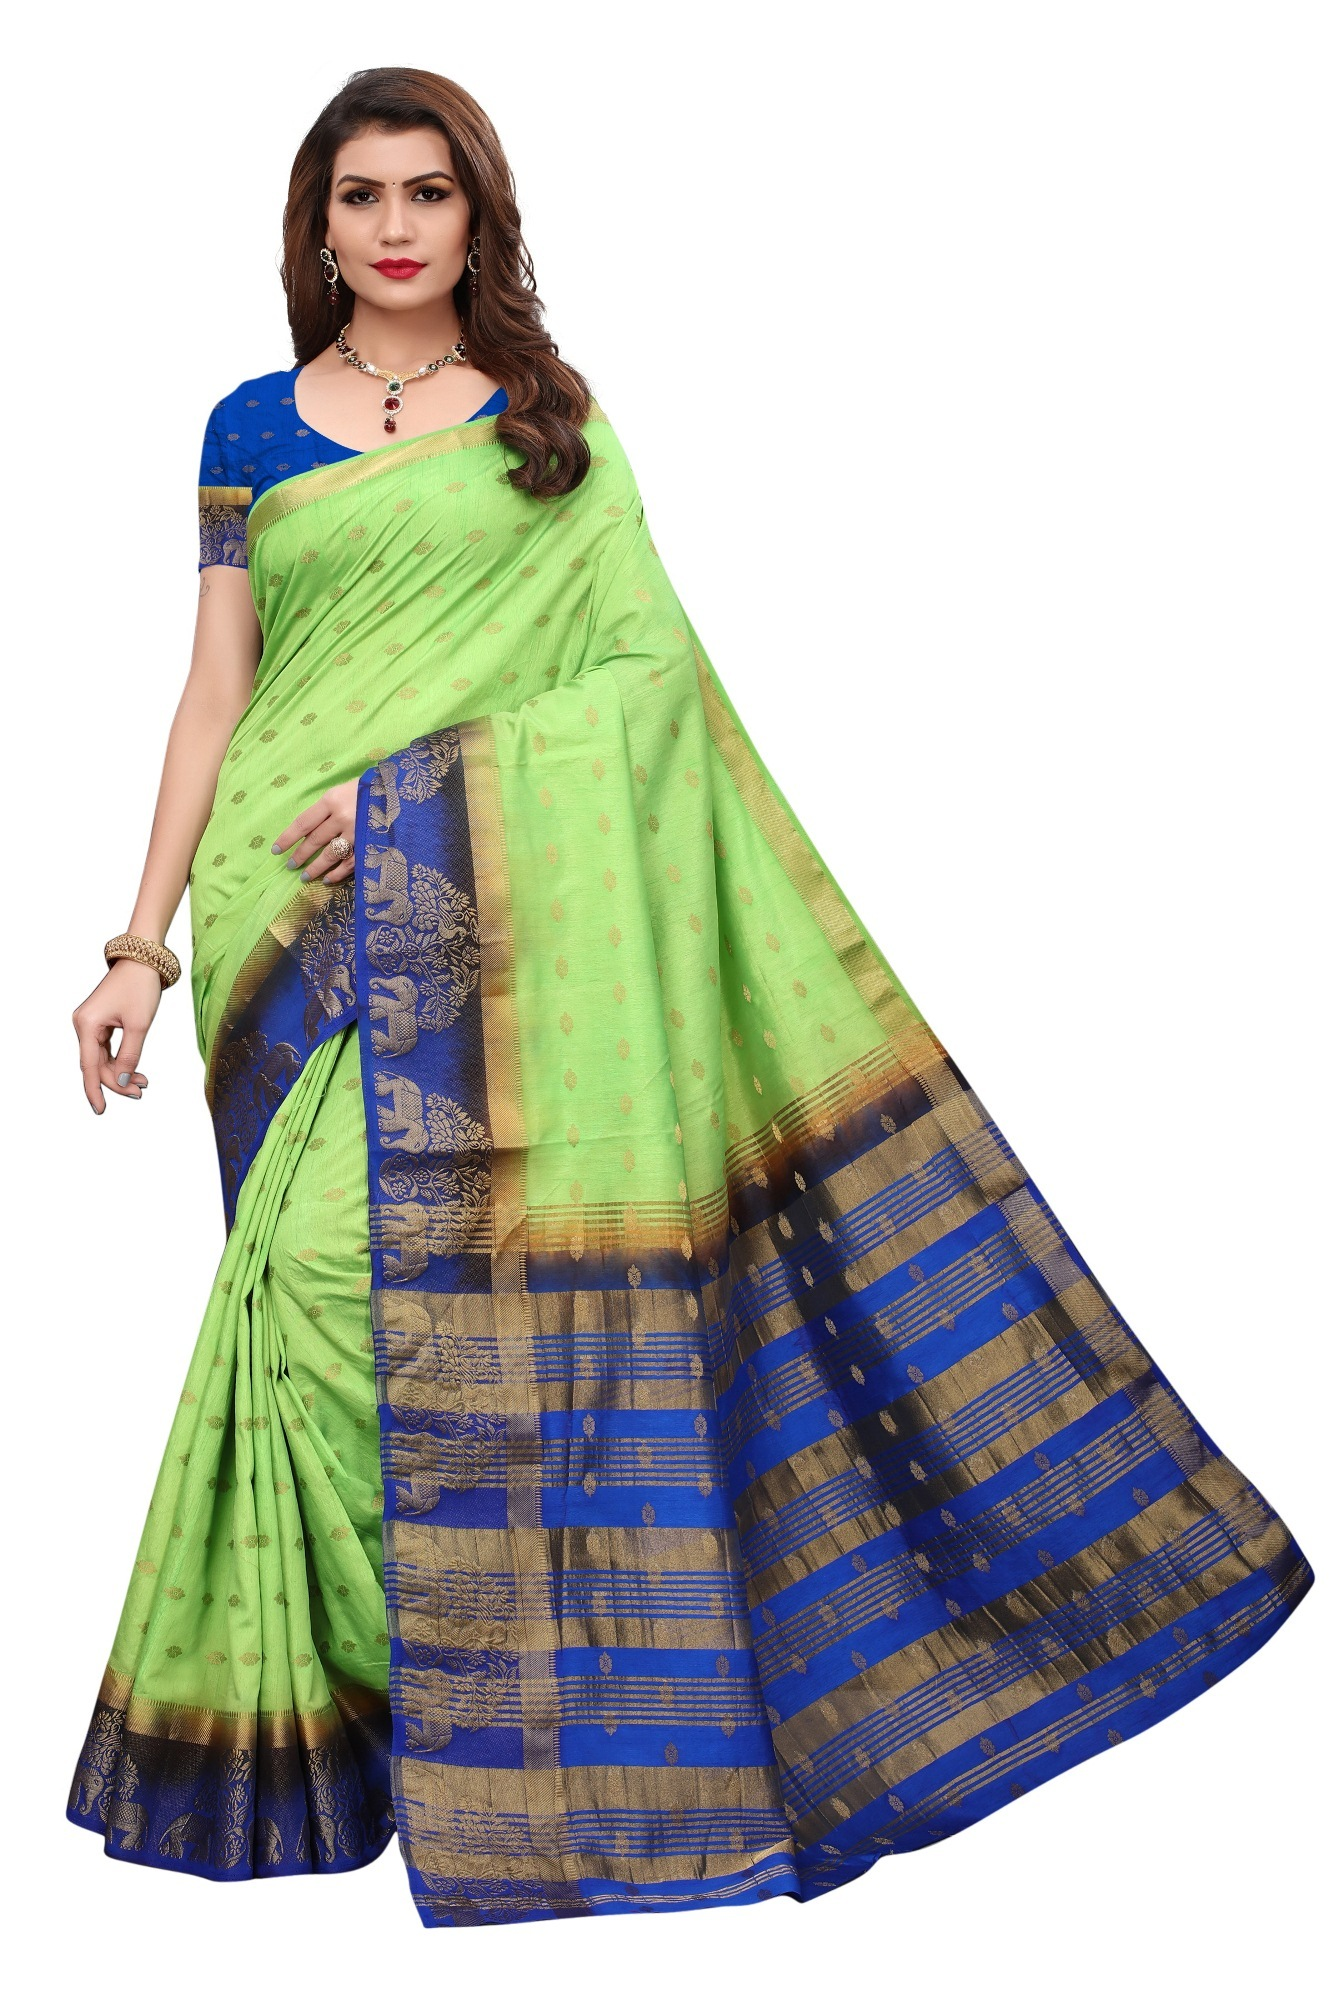 New Kanjivaram Fancy Saree